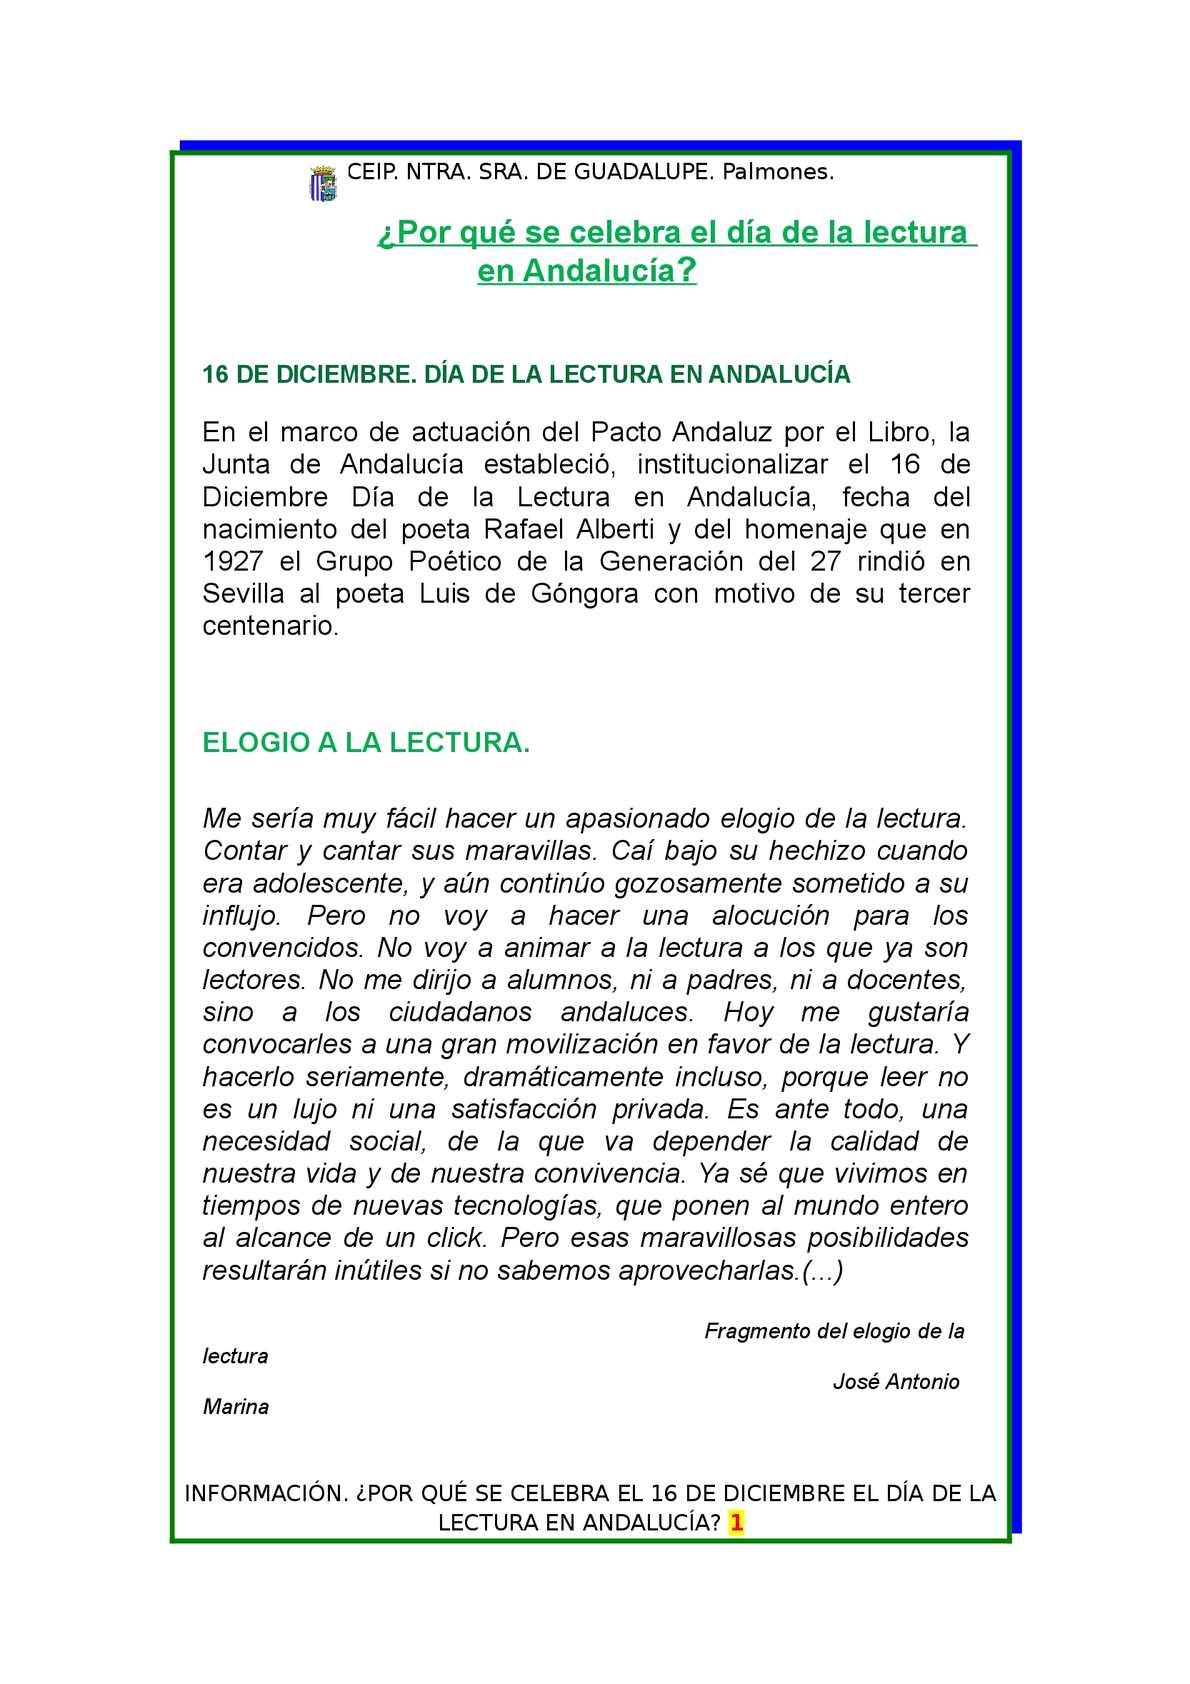 Calaméo - Día de la lectura en Andalucía, 16 diciembre. Información.